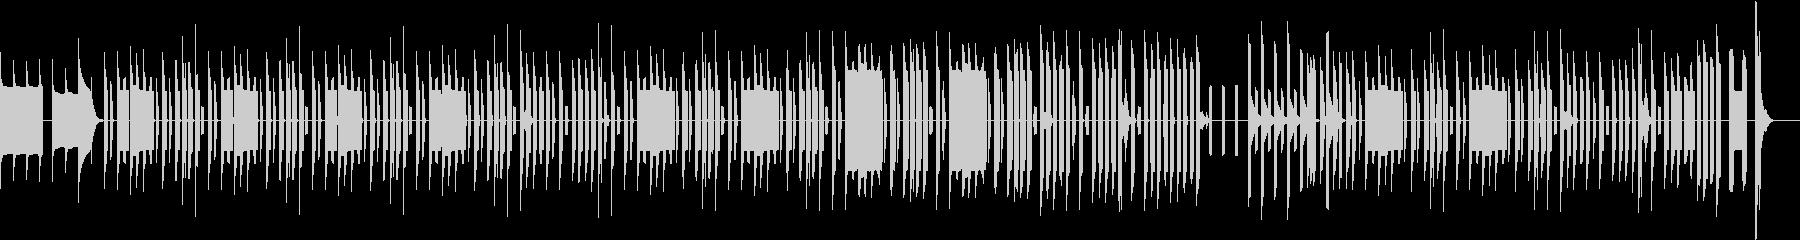 KANT8bit60秒コミカルBGMの未再生の波形